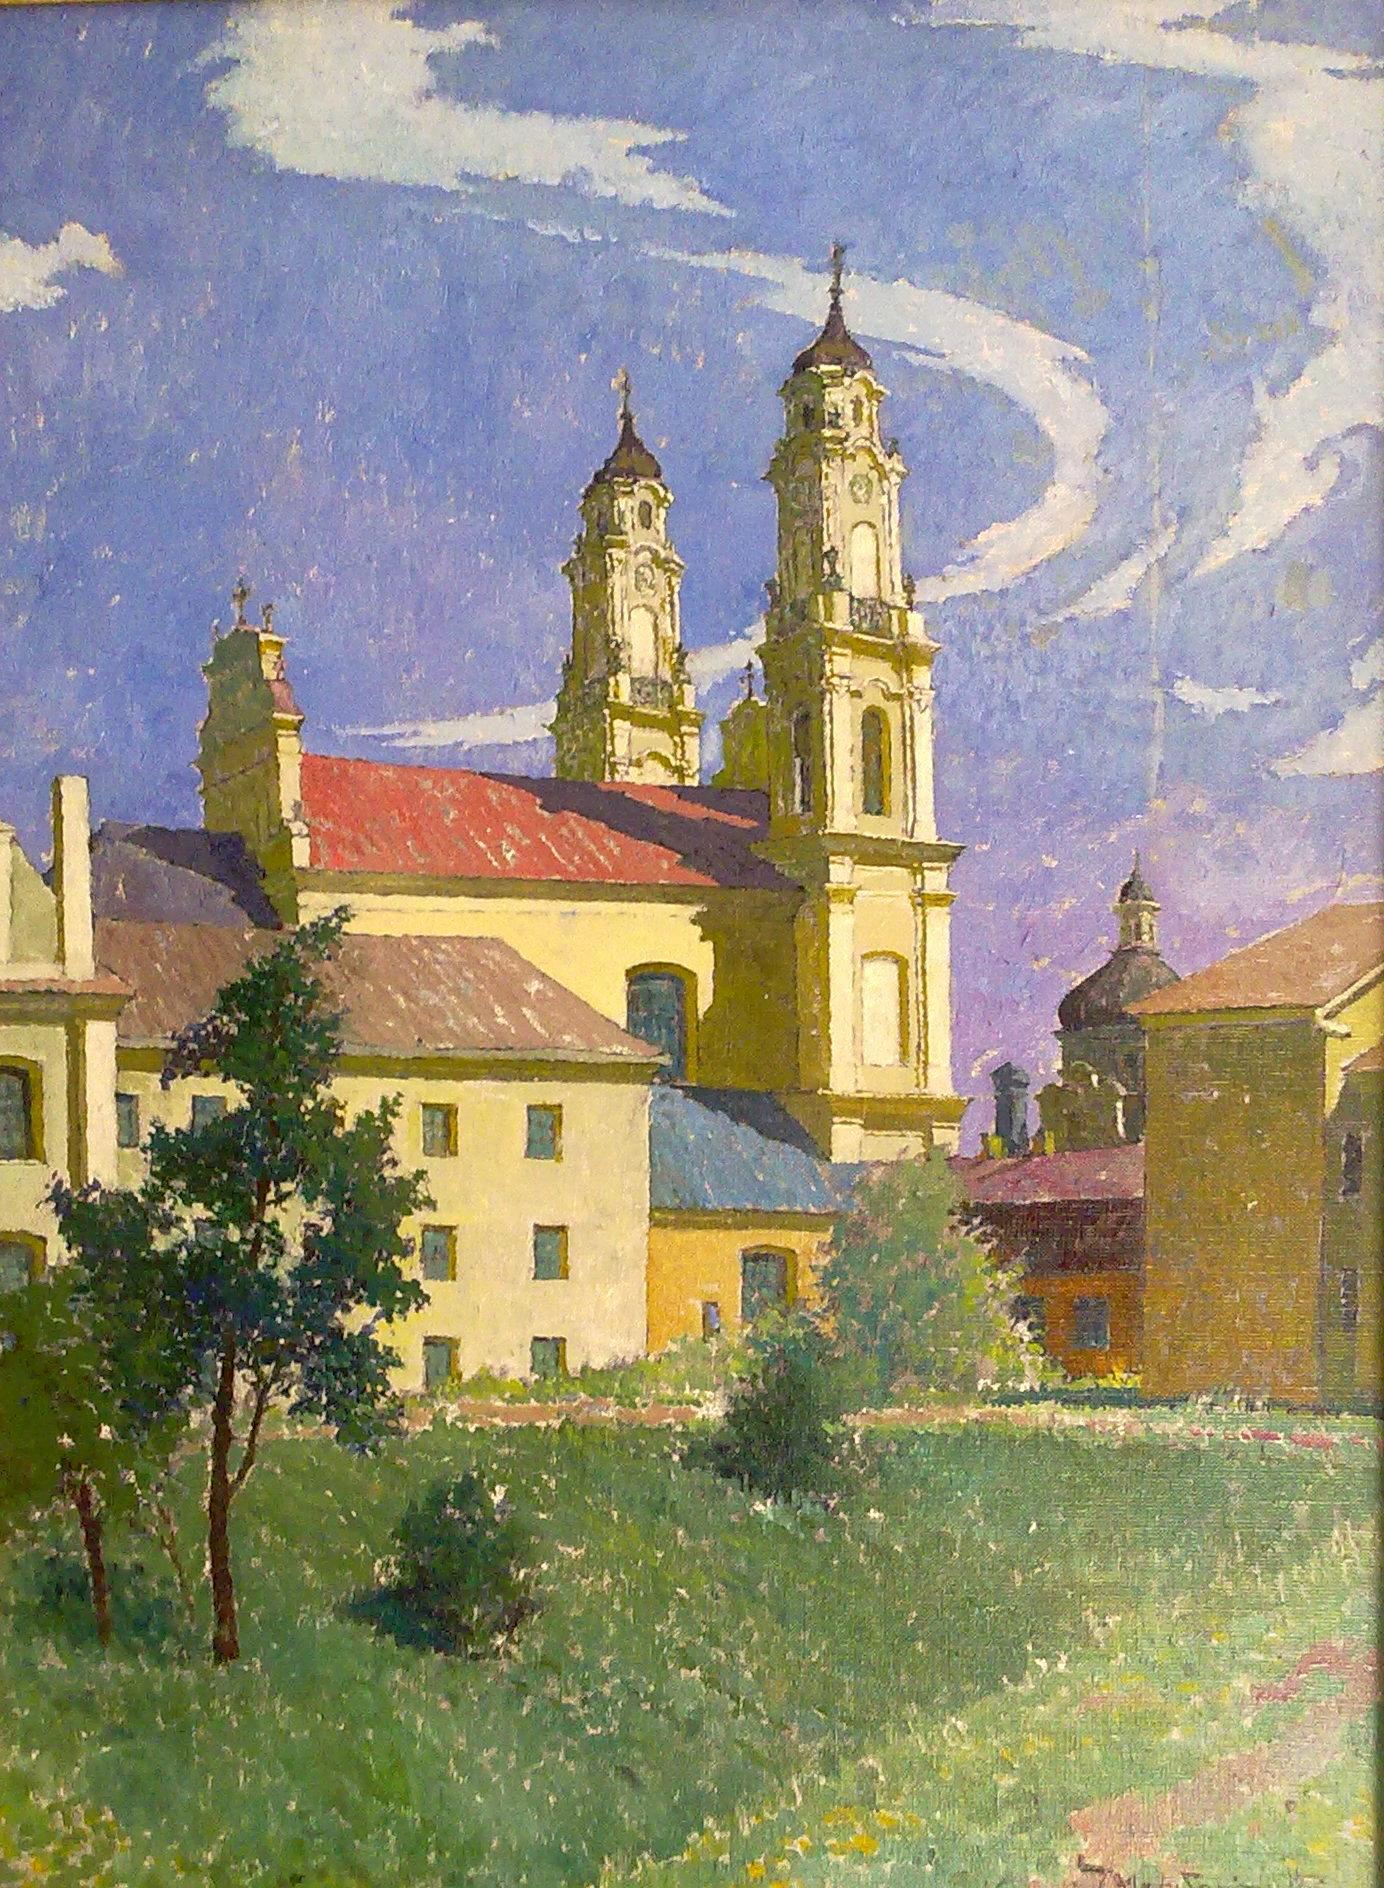 Misionierių bažnyčia, 1983, 80x60